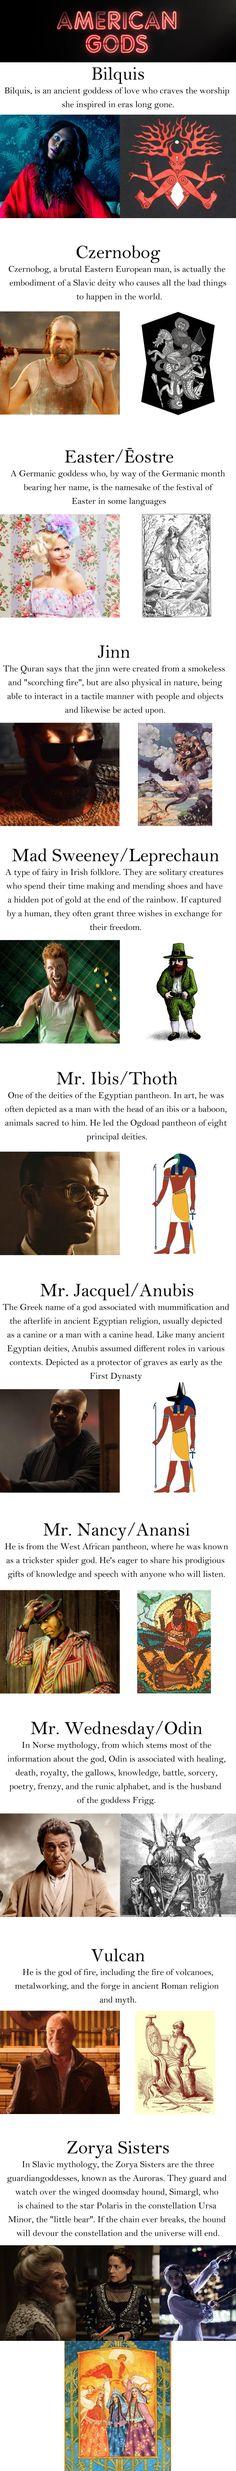 American Gods Old Gods (Spoilers)